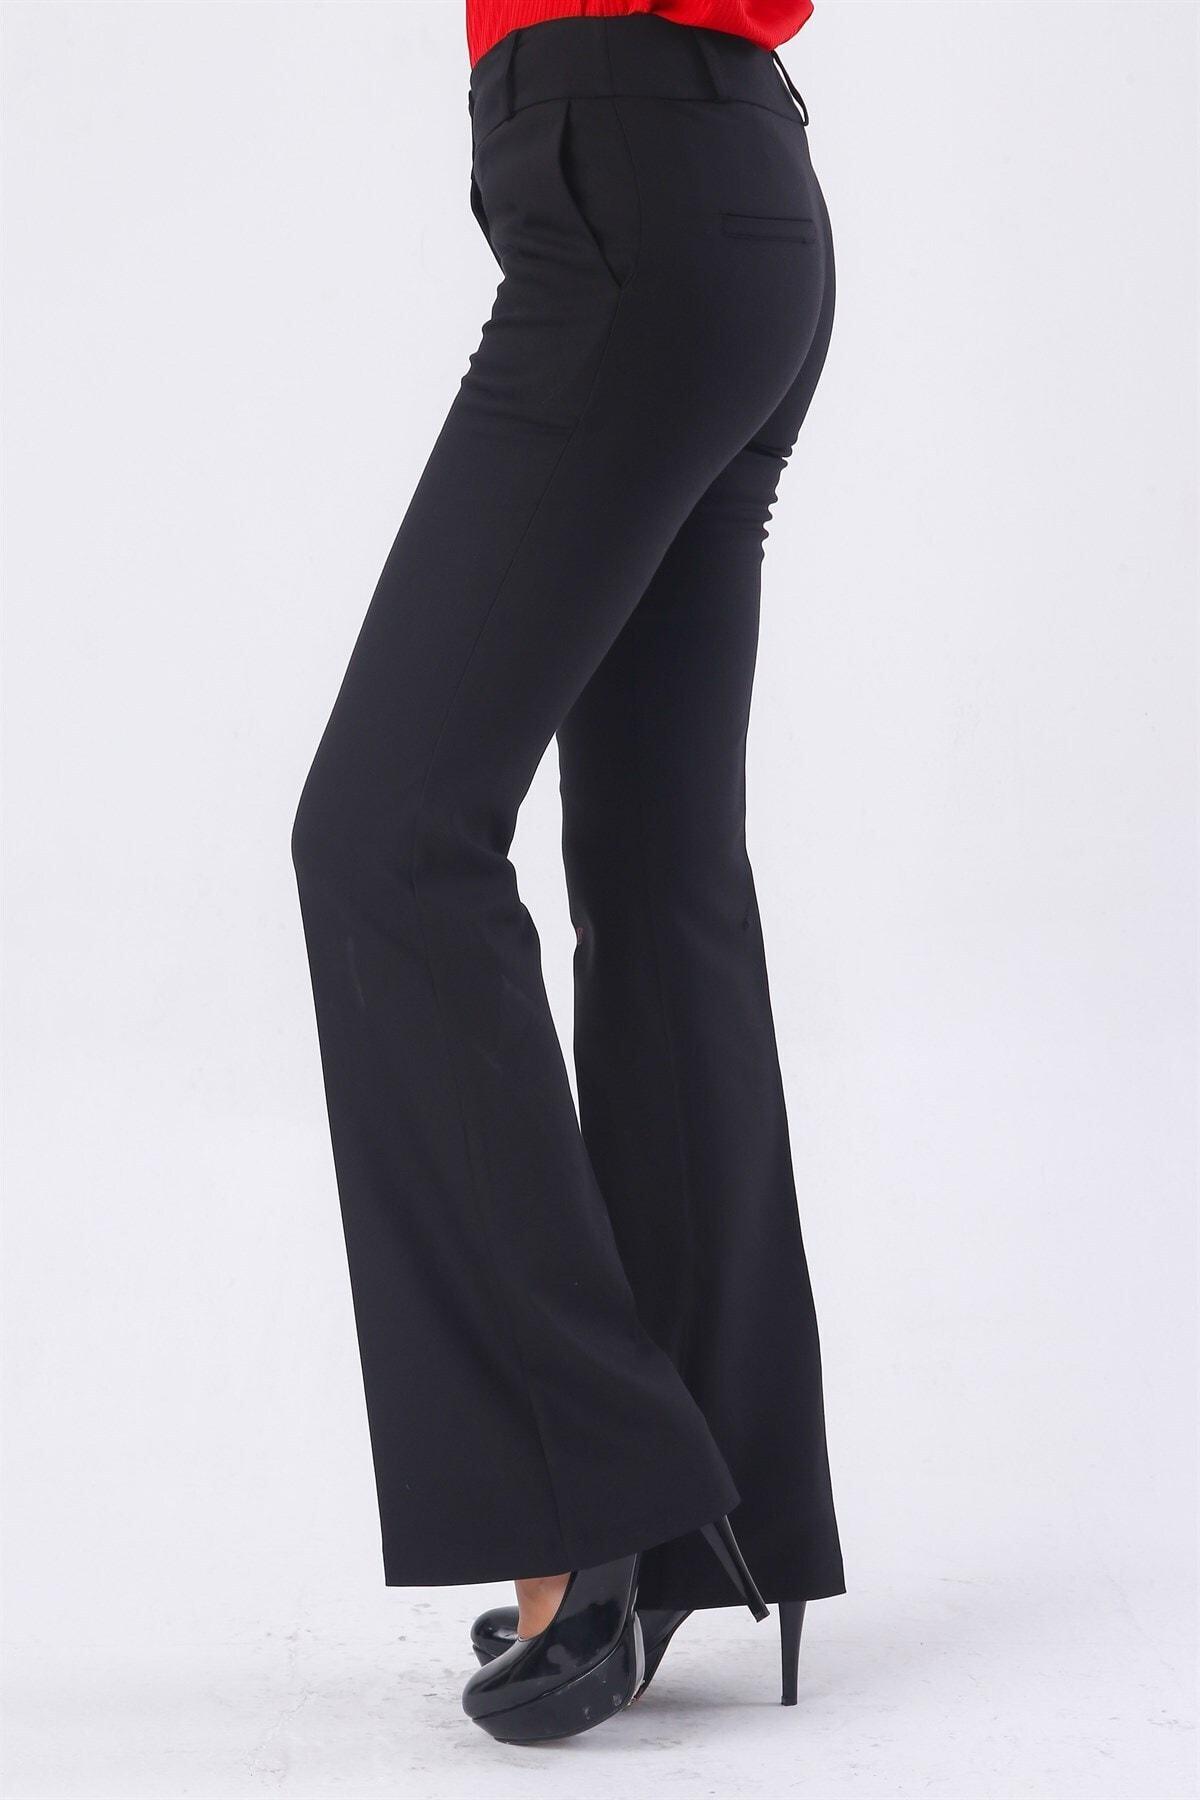 Jument Kadın Kalın Kemerli Cepli Ispanyol Bol Paça Likralı Kumaş Pantolon-siyah